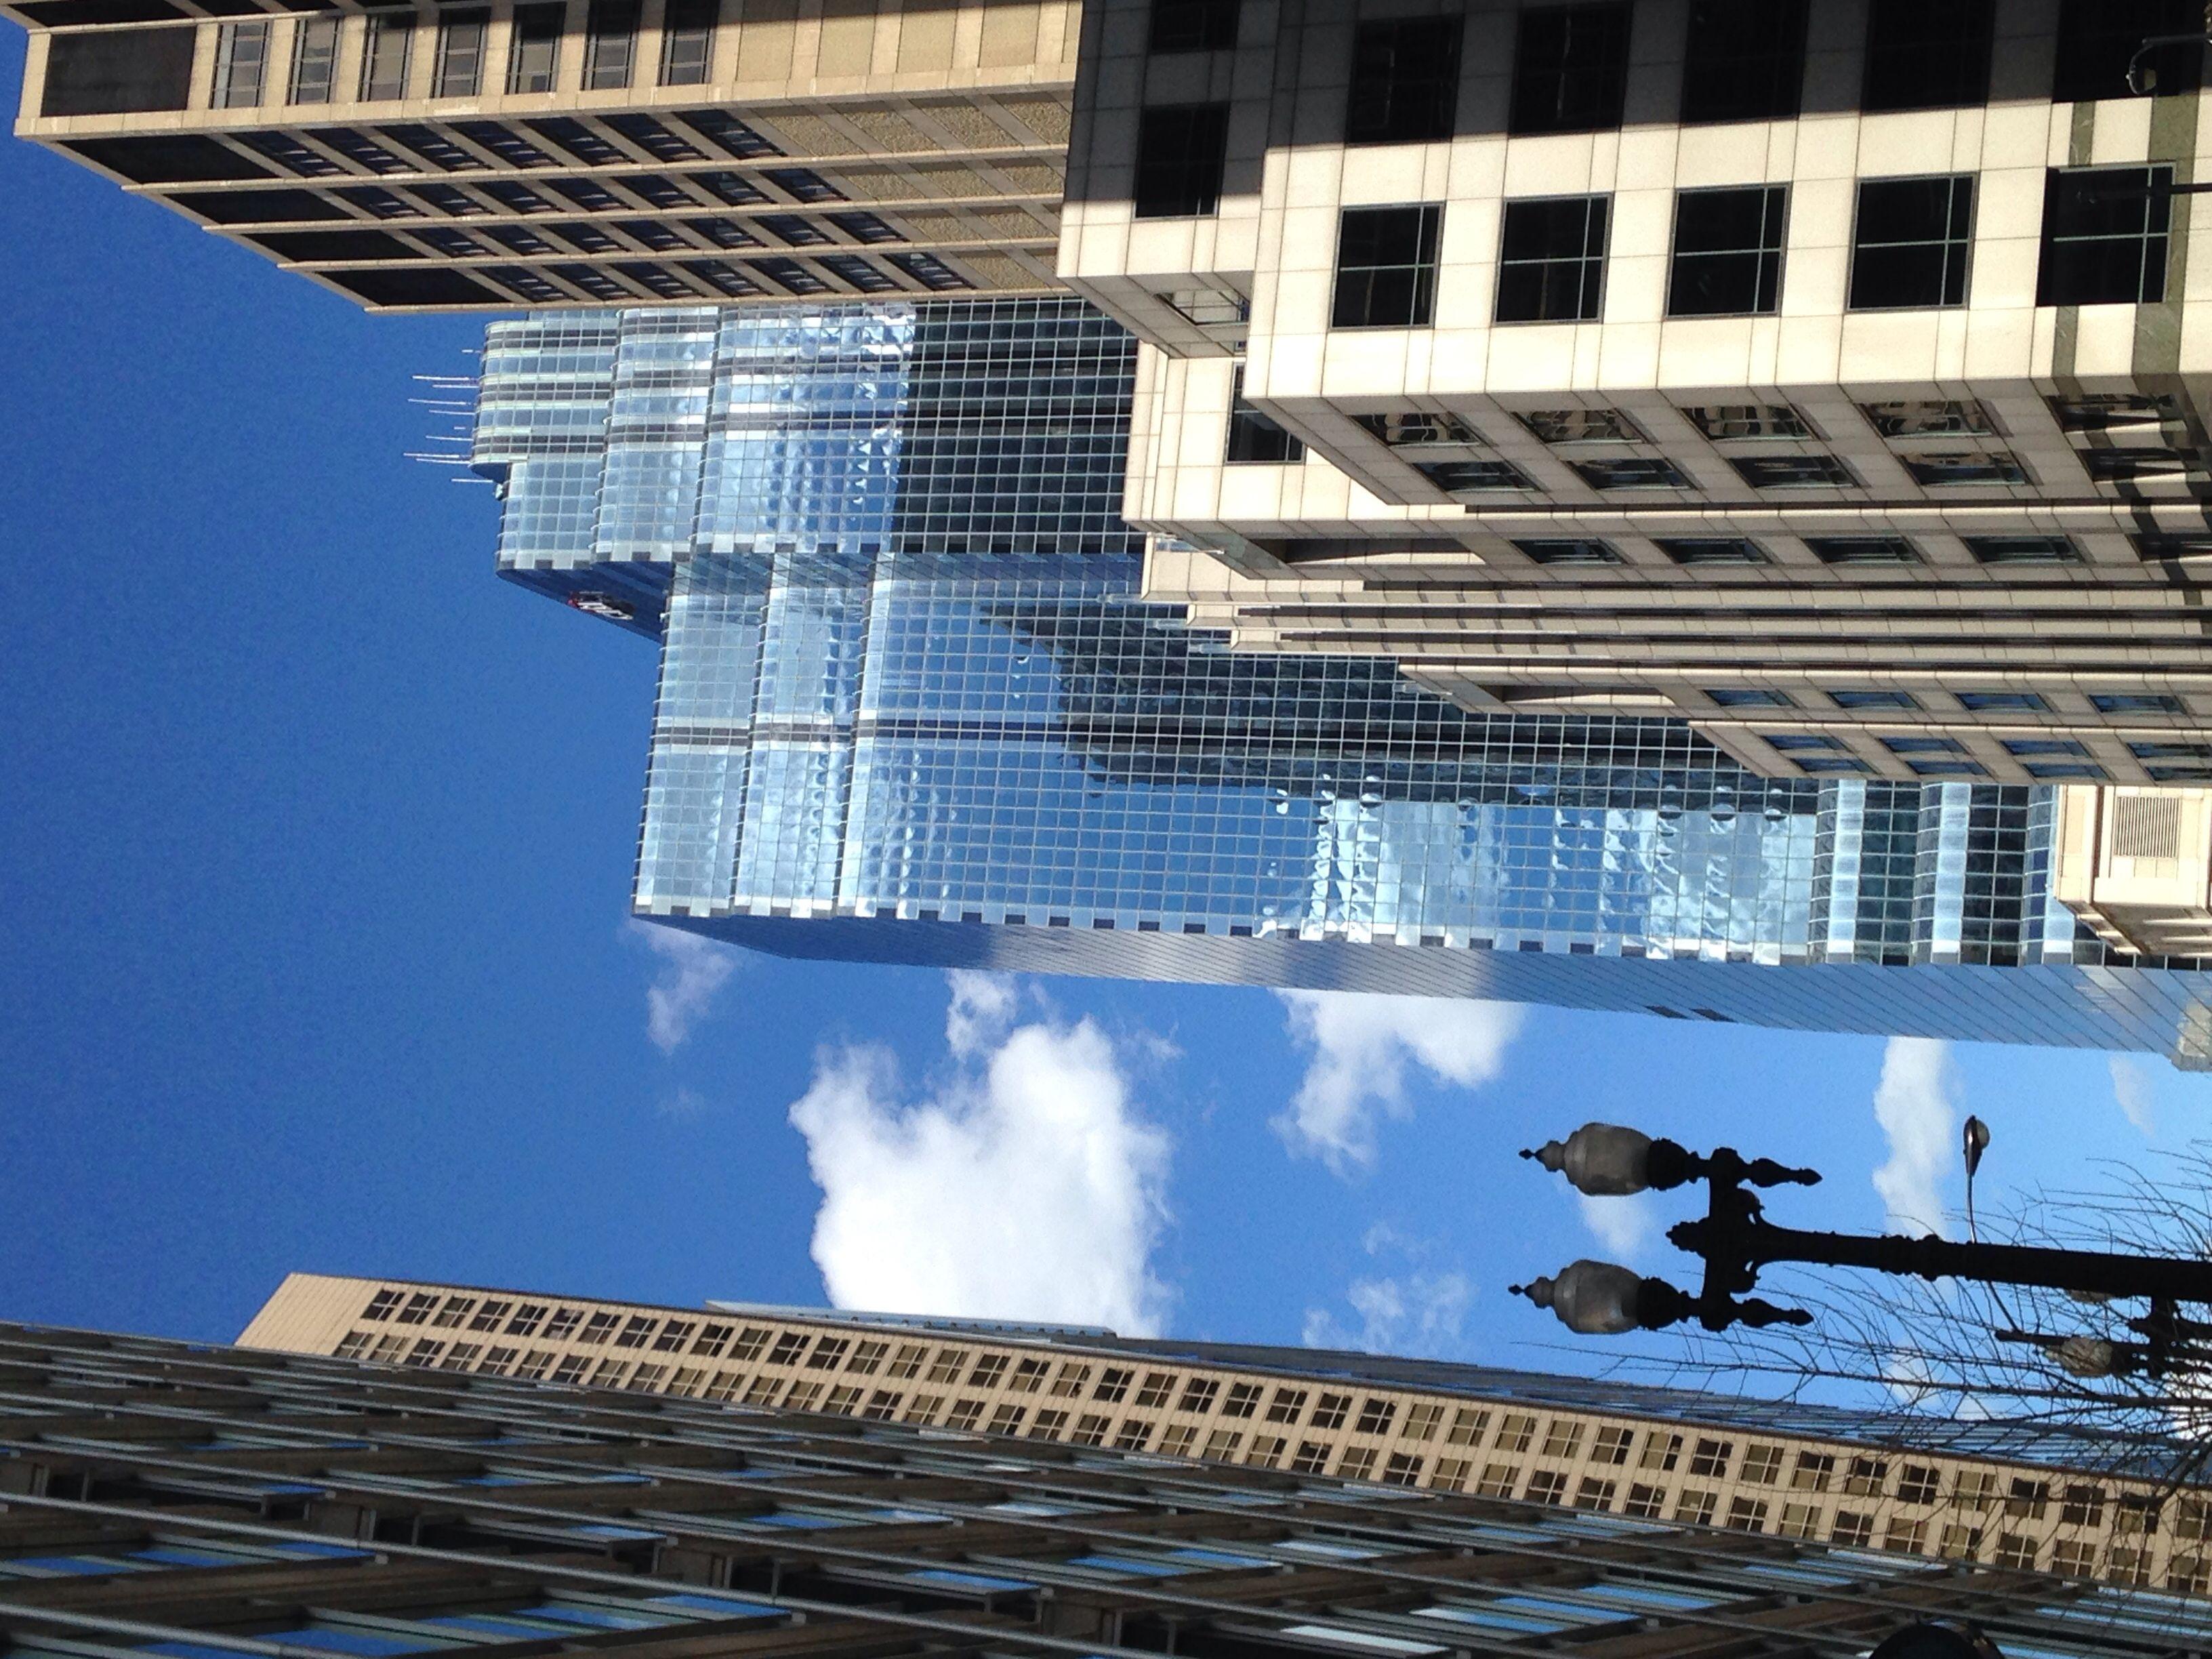 Citi Tower Skyscraper, Tower, Willis tower